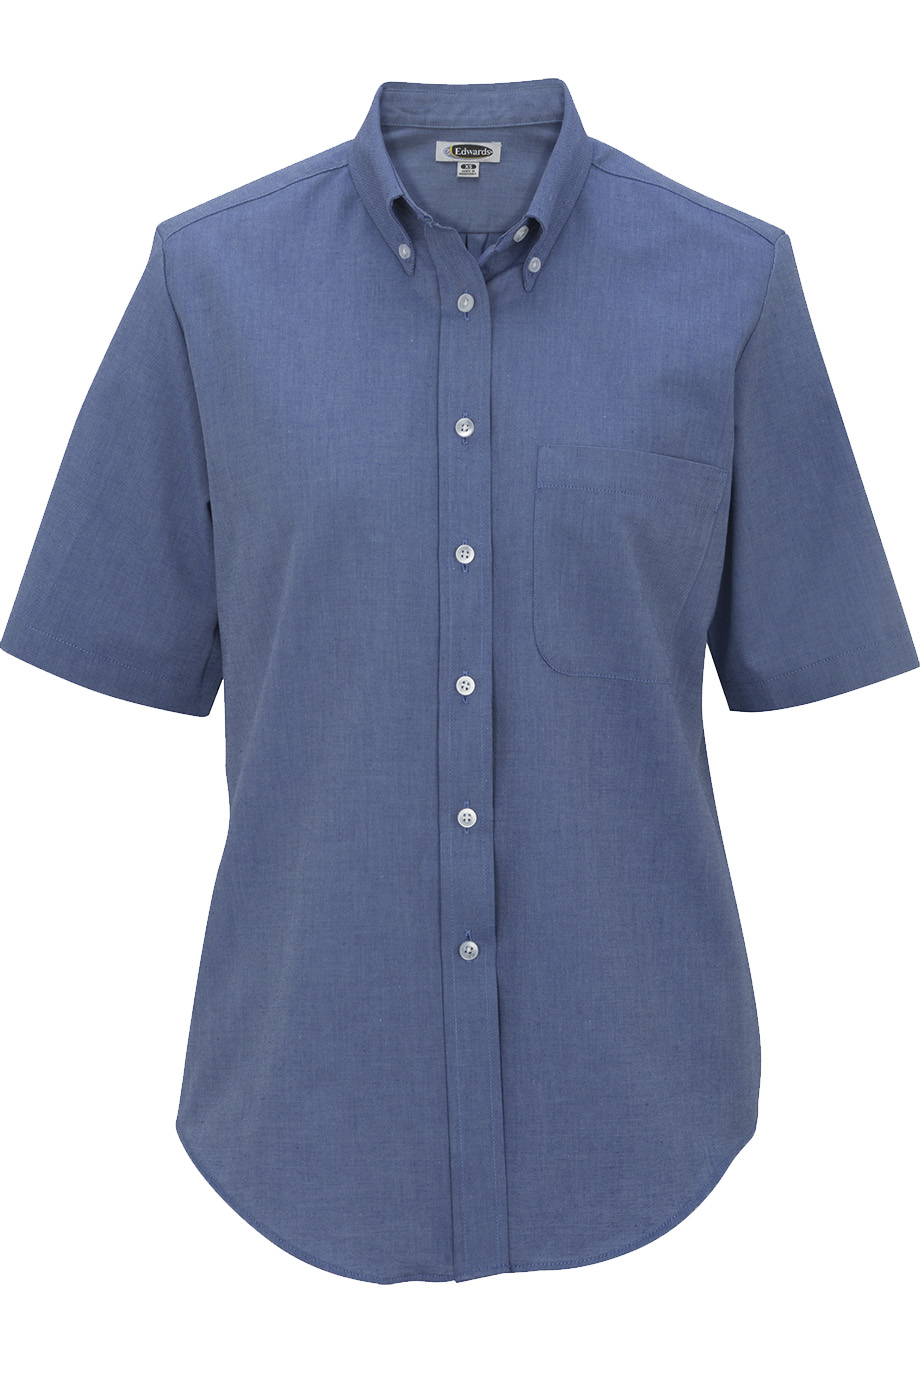 Ladies' Short Sleeve Oxford Shirt 5027